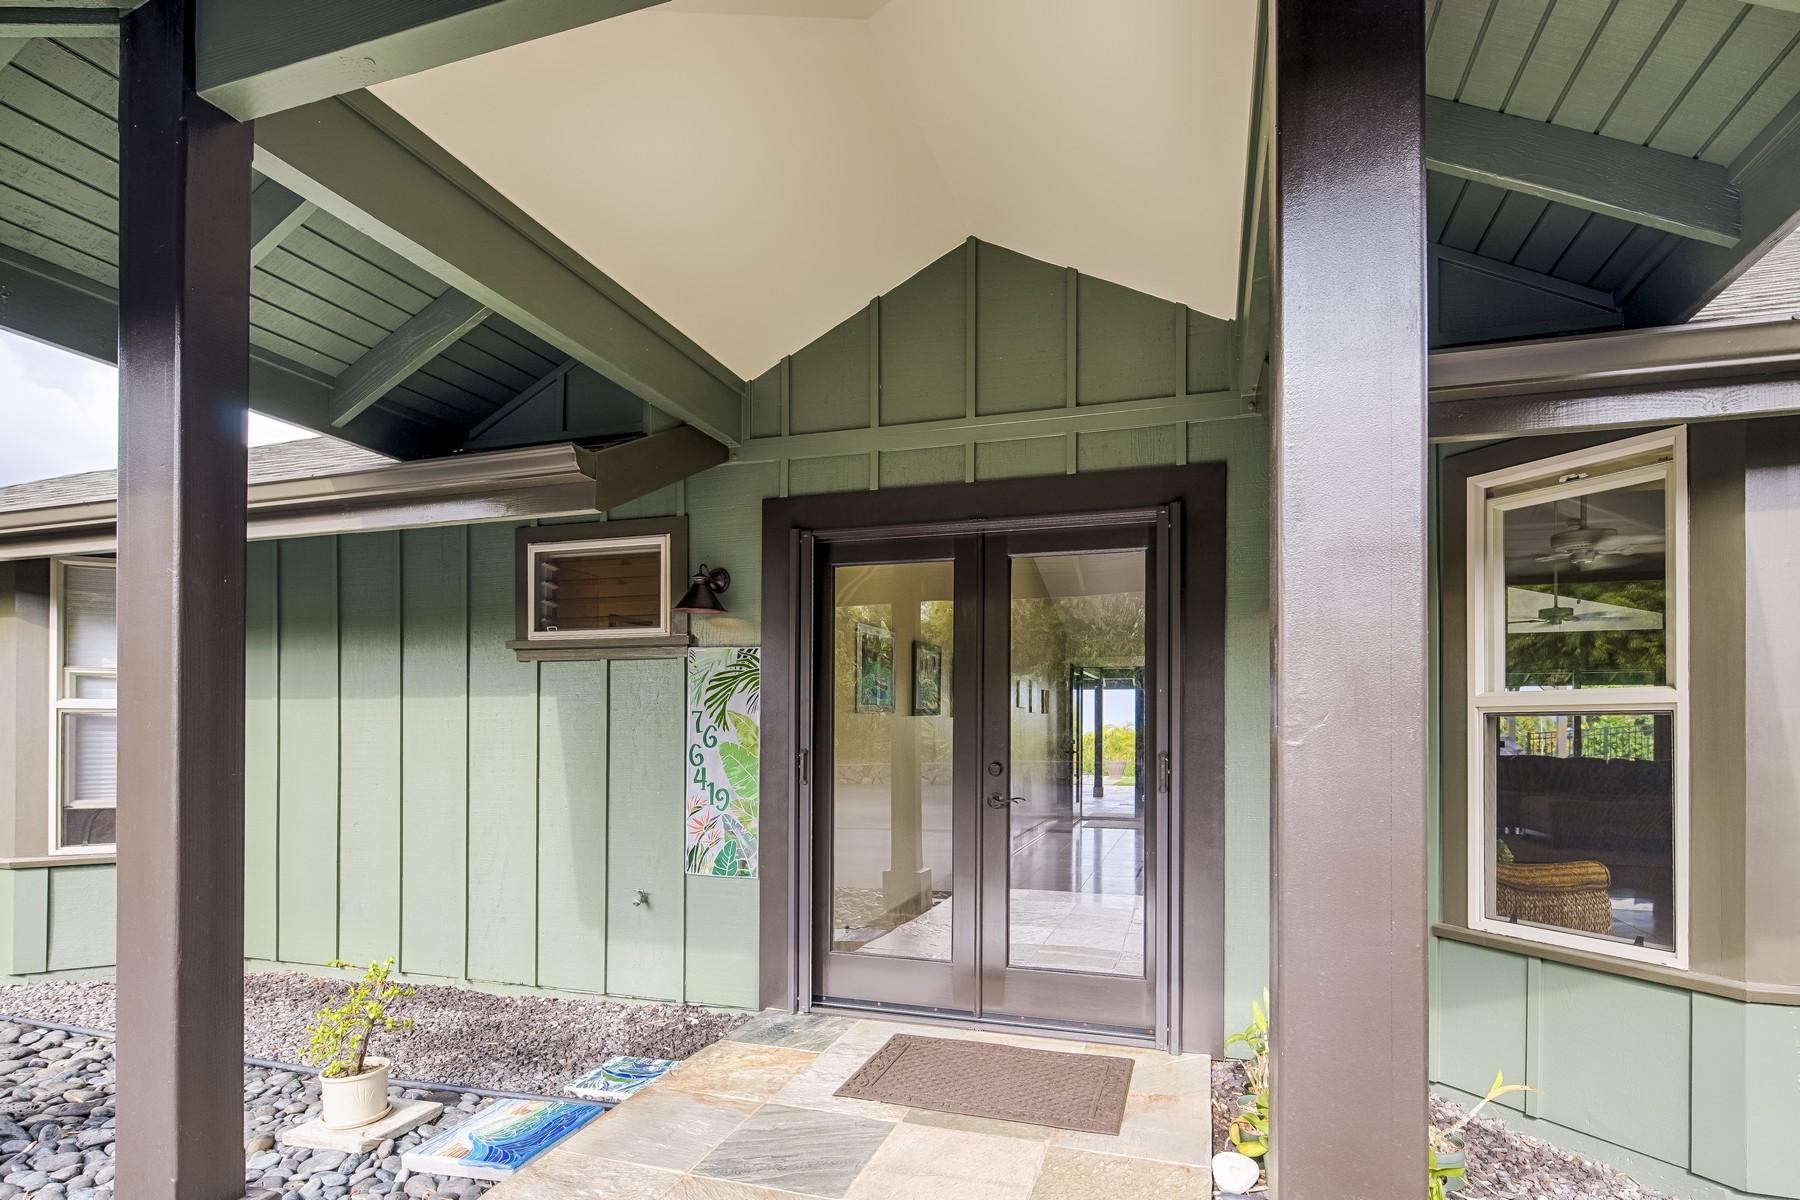 Single Family Home for Sale at Lani Kai Estates 76-6419 Nightengale Lane, Kailua-Kona, Hawaii, 96740 United States